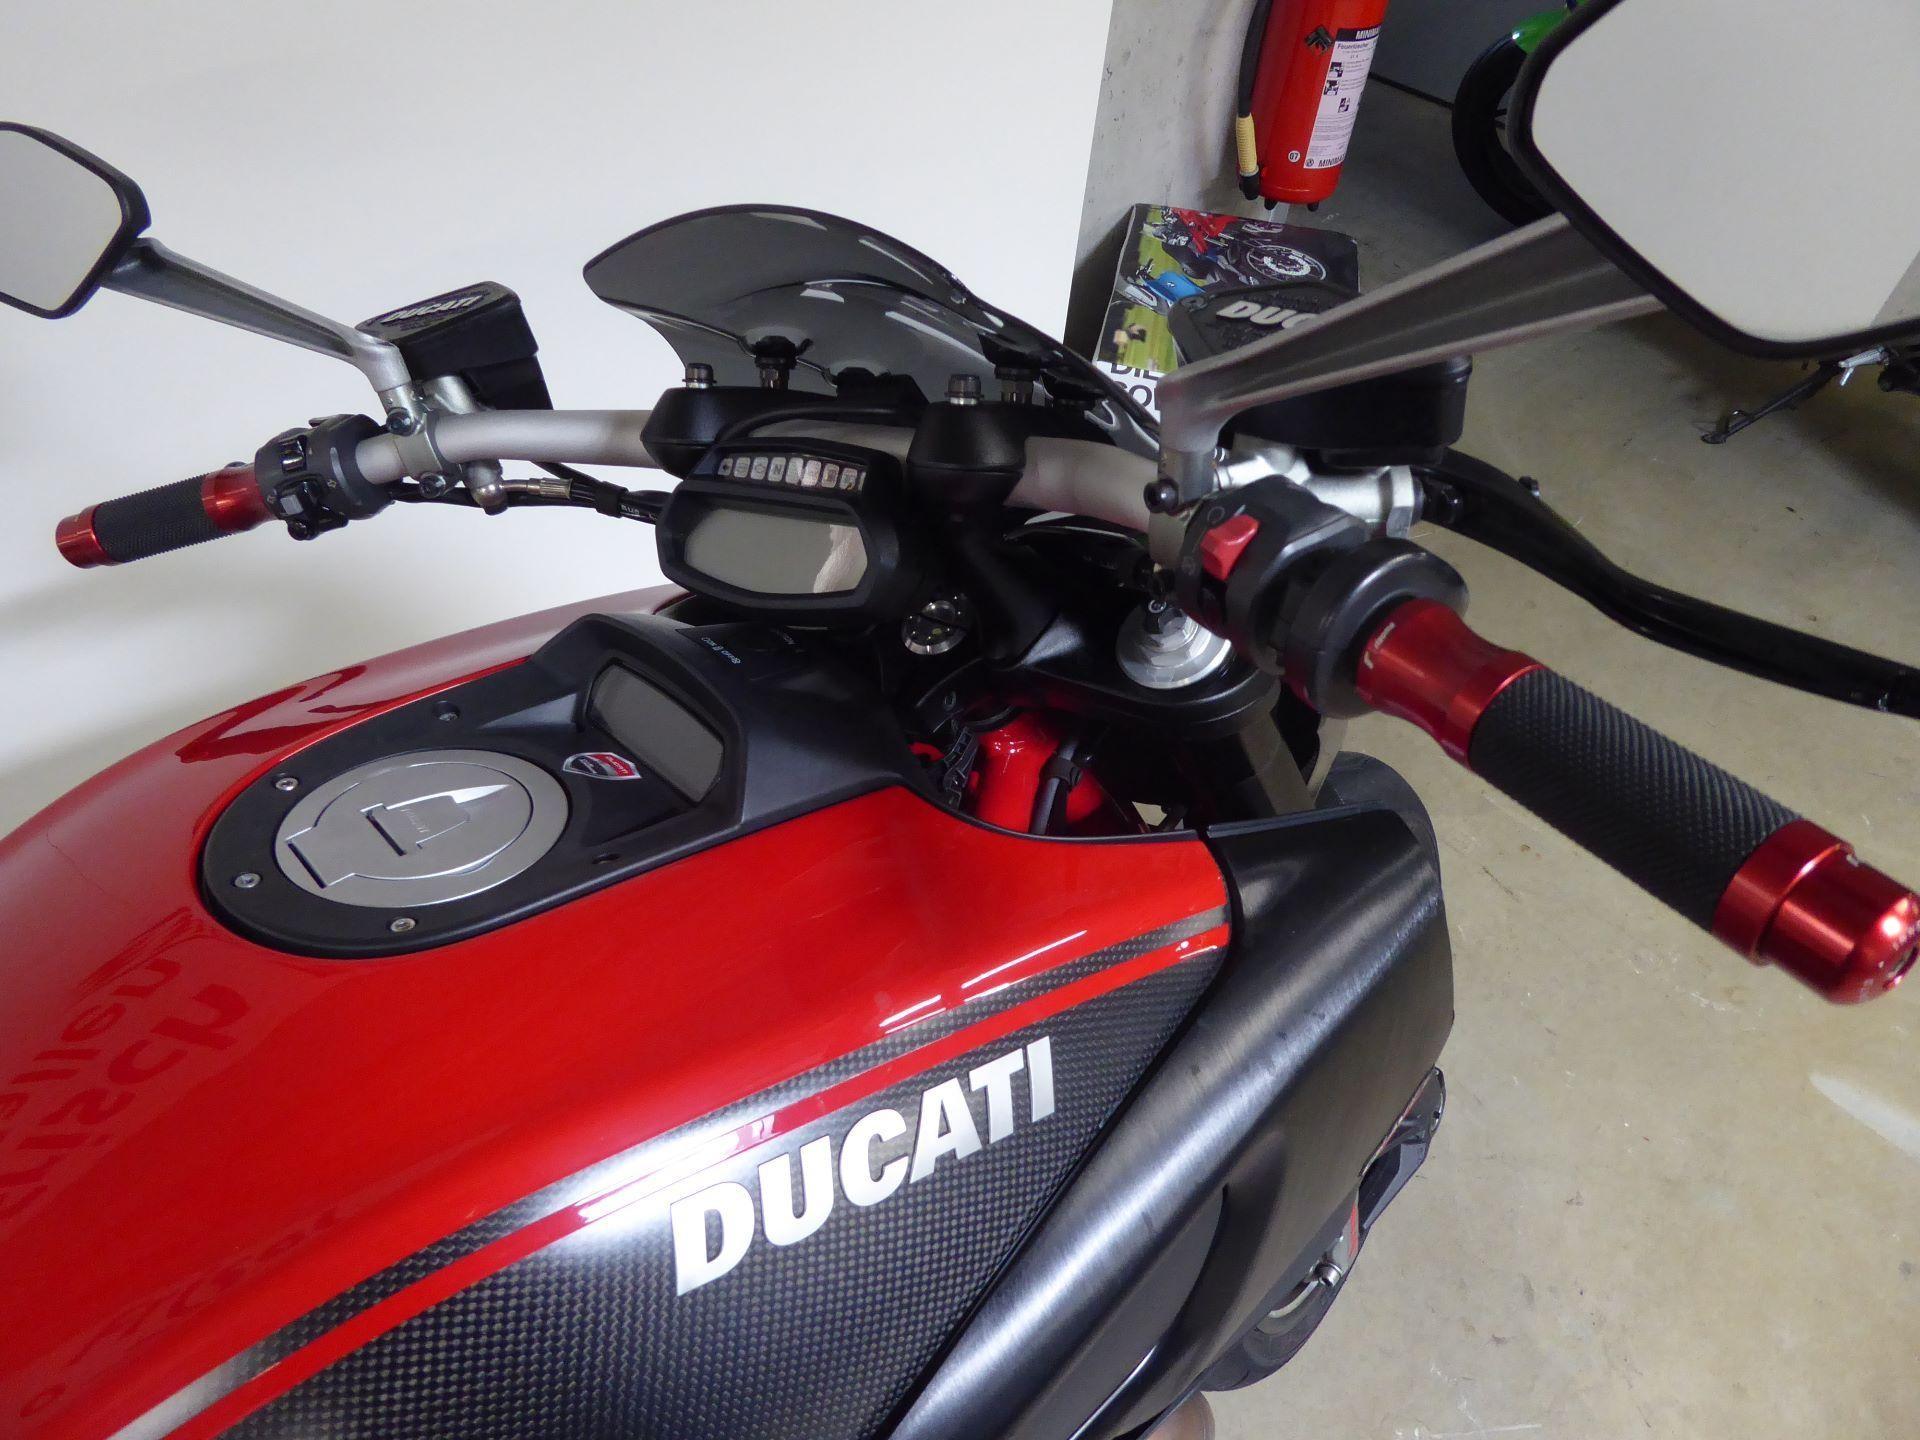 motorrad occasion kaufen ducati 1198 diavel carbon abs ren frisch ag st gallen. Black Bedroom Furniture Sets. Home Design Ideas